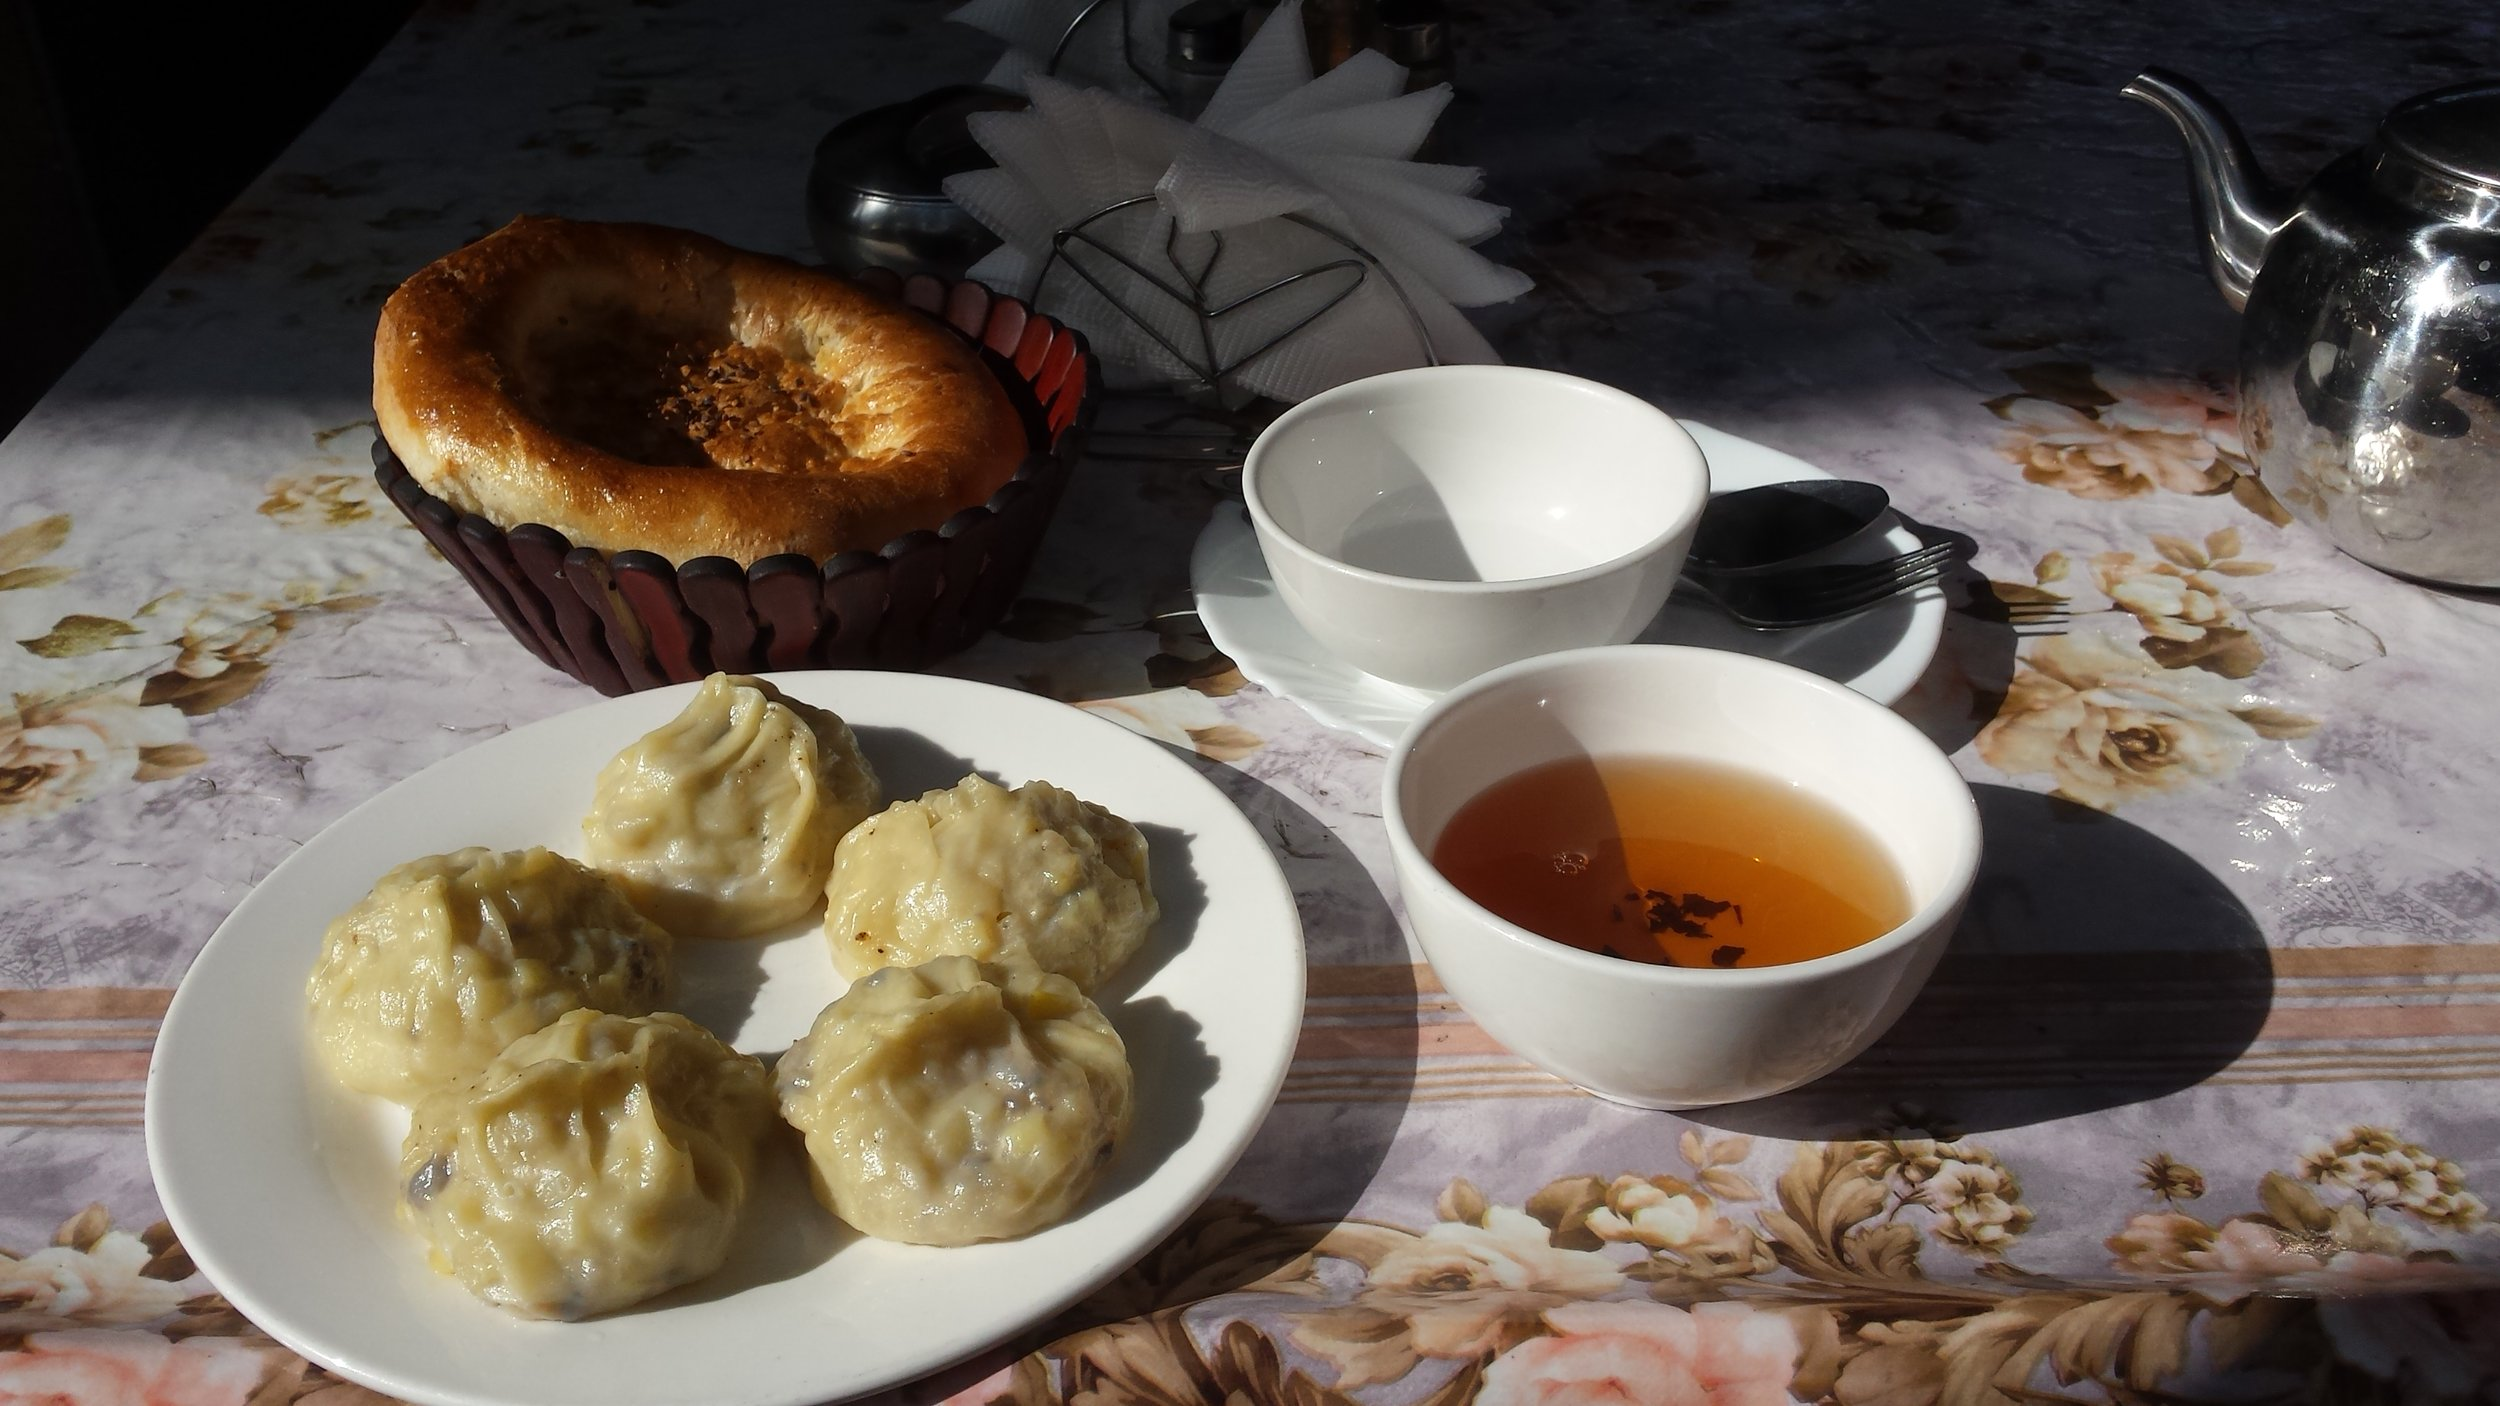 Manty - Kyrgyz dumplings.